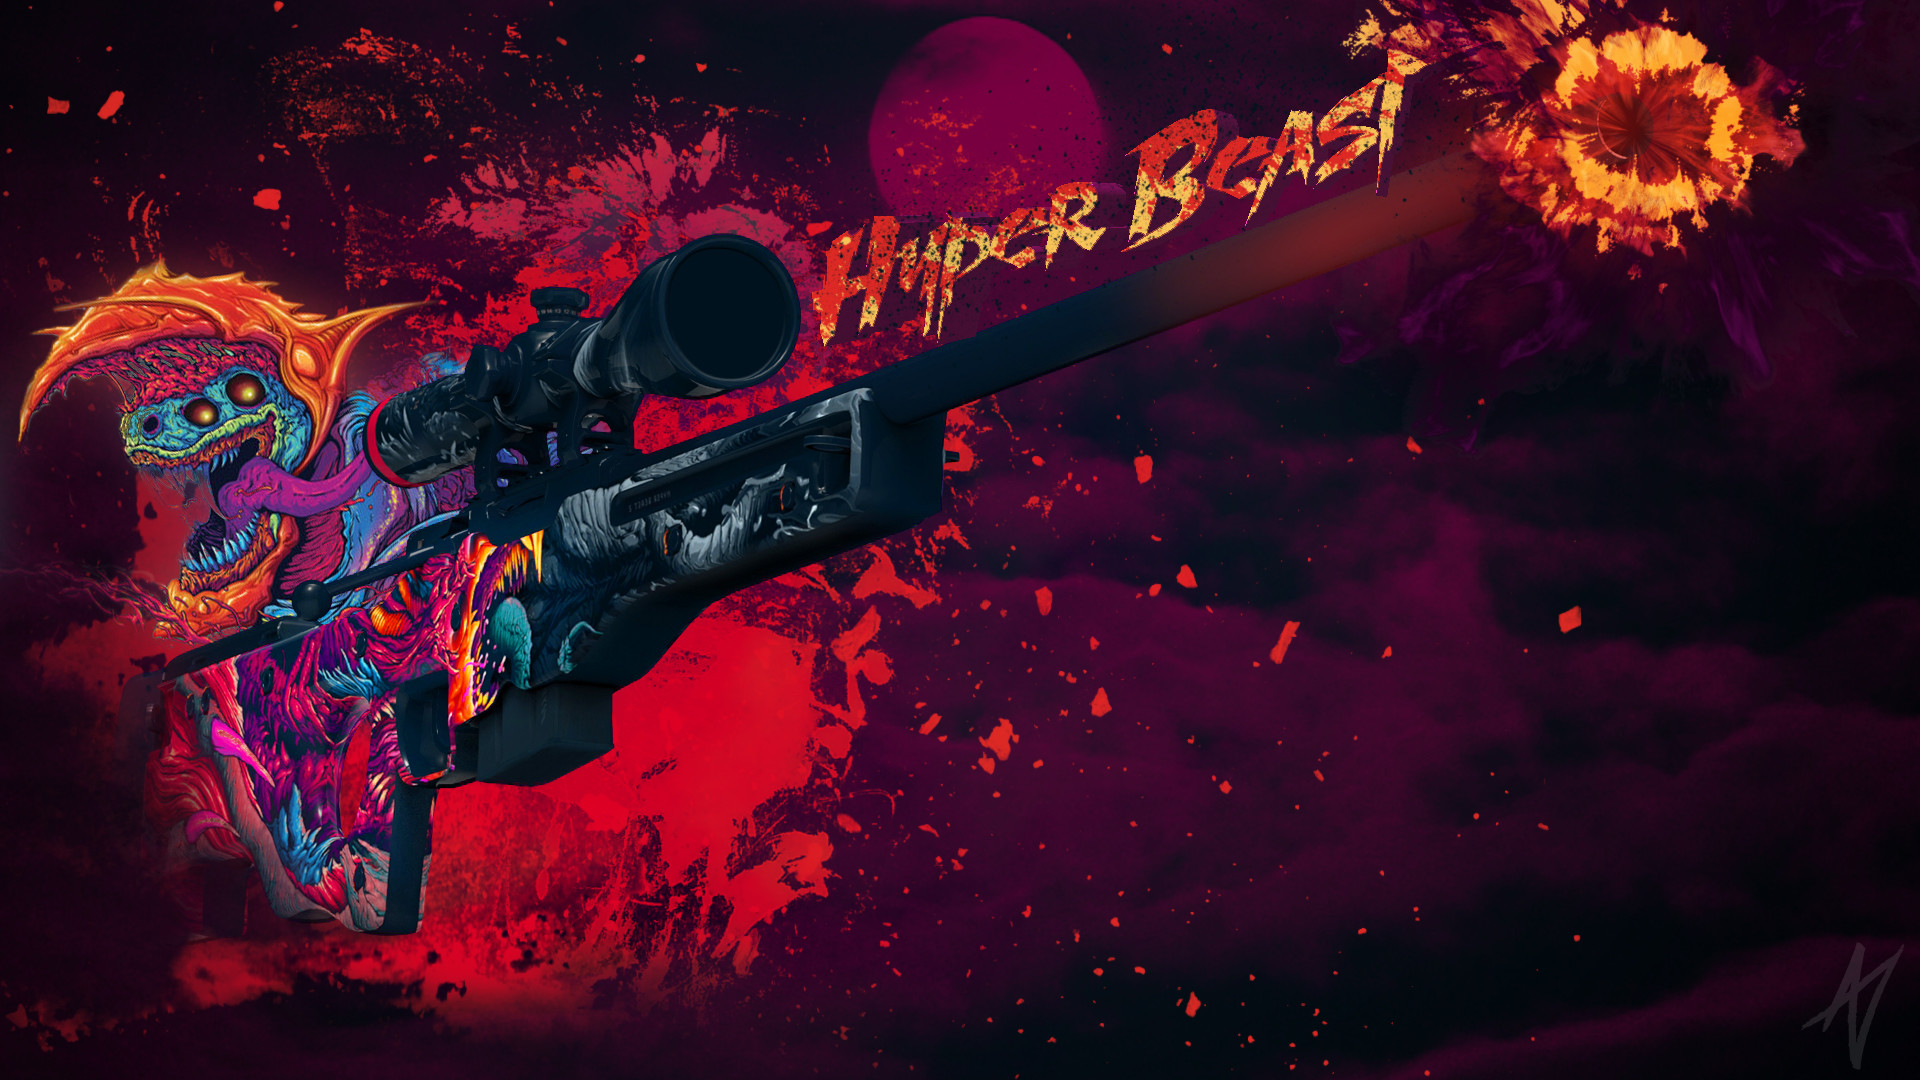 AWP Hyper Beast. ×. ESC. Search your wallpaper. GO